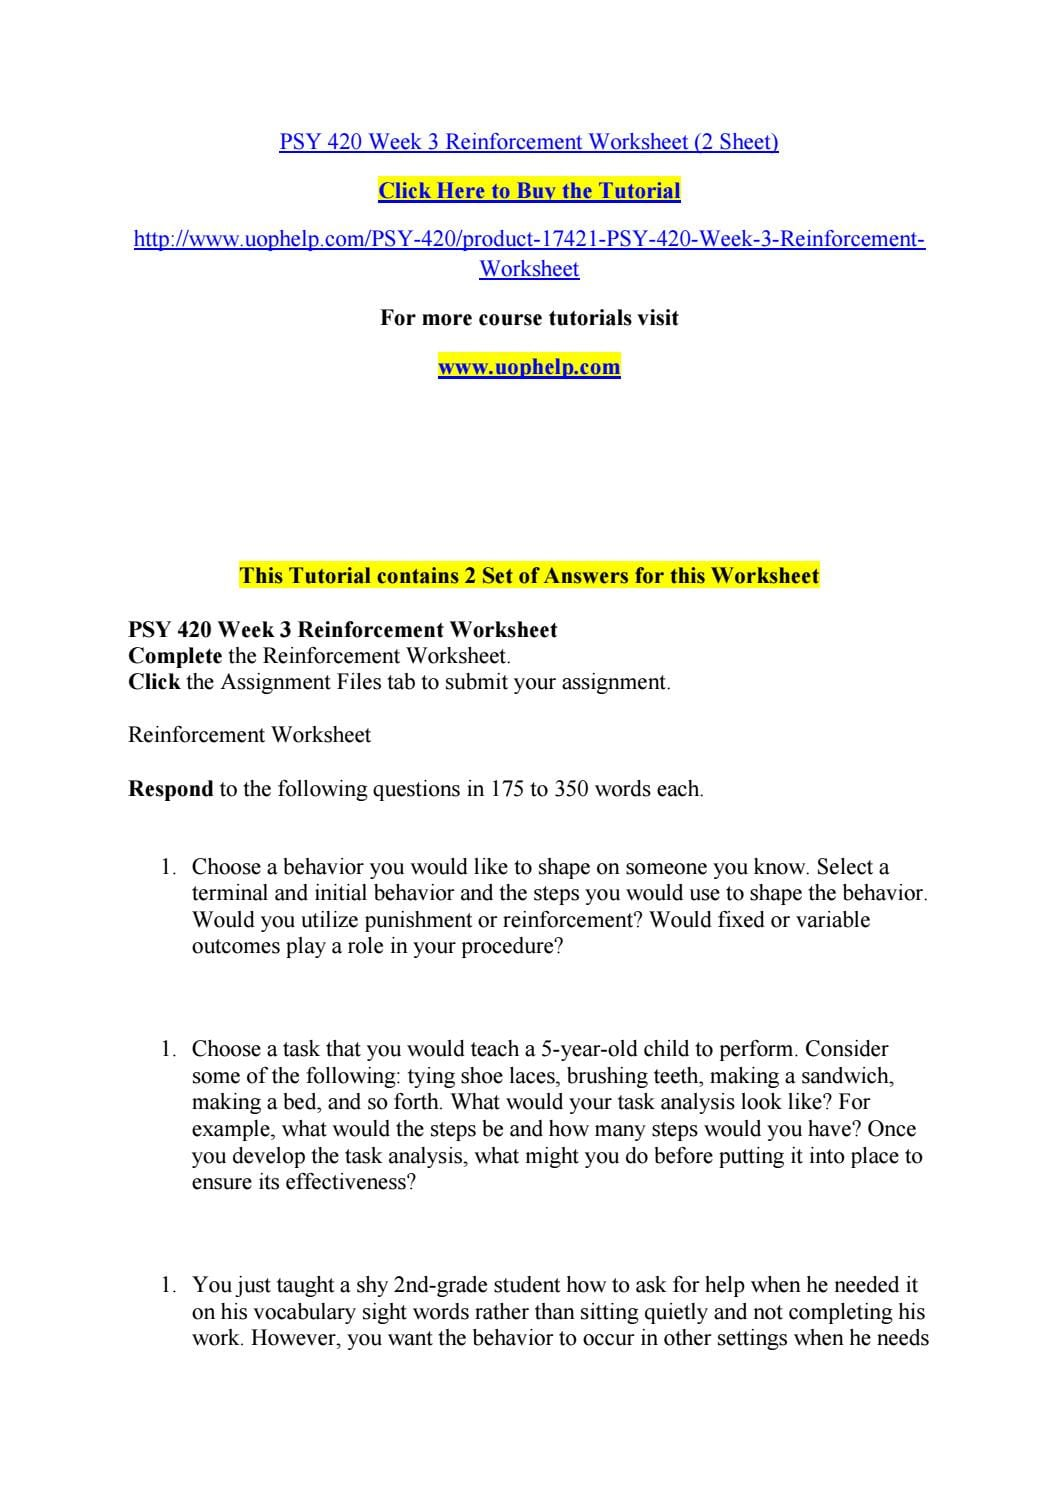 Psy 420 Week 3 Reinforcement Worksheet 2 Sheet